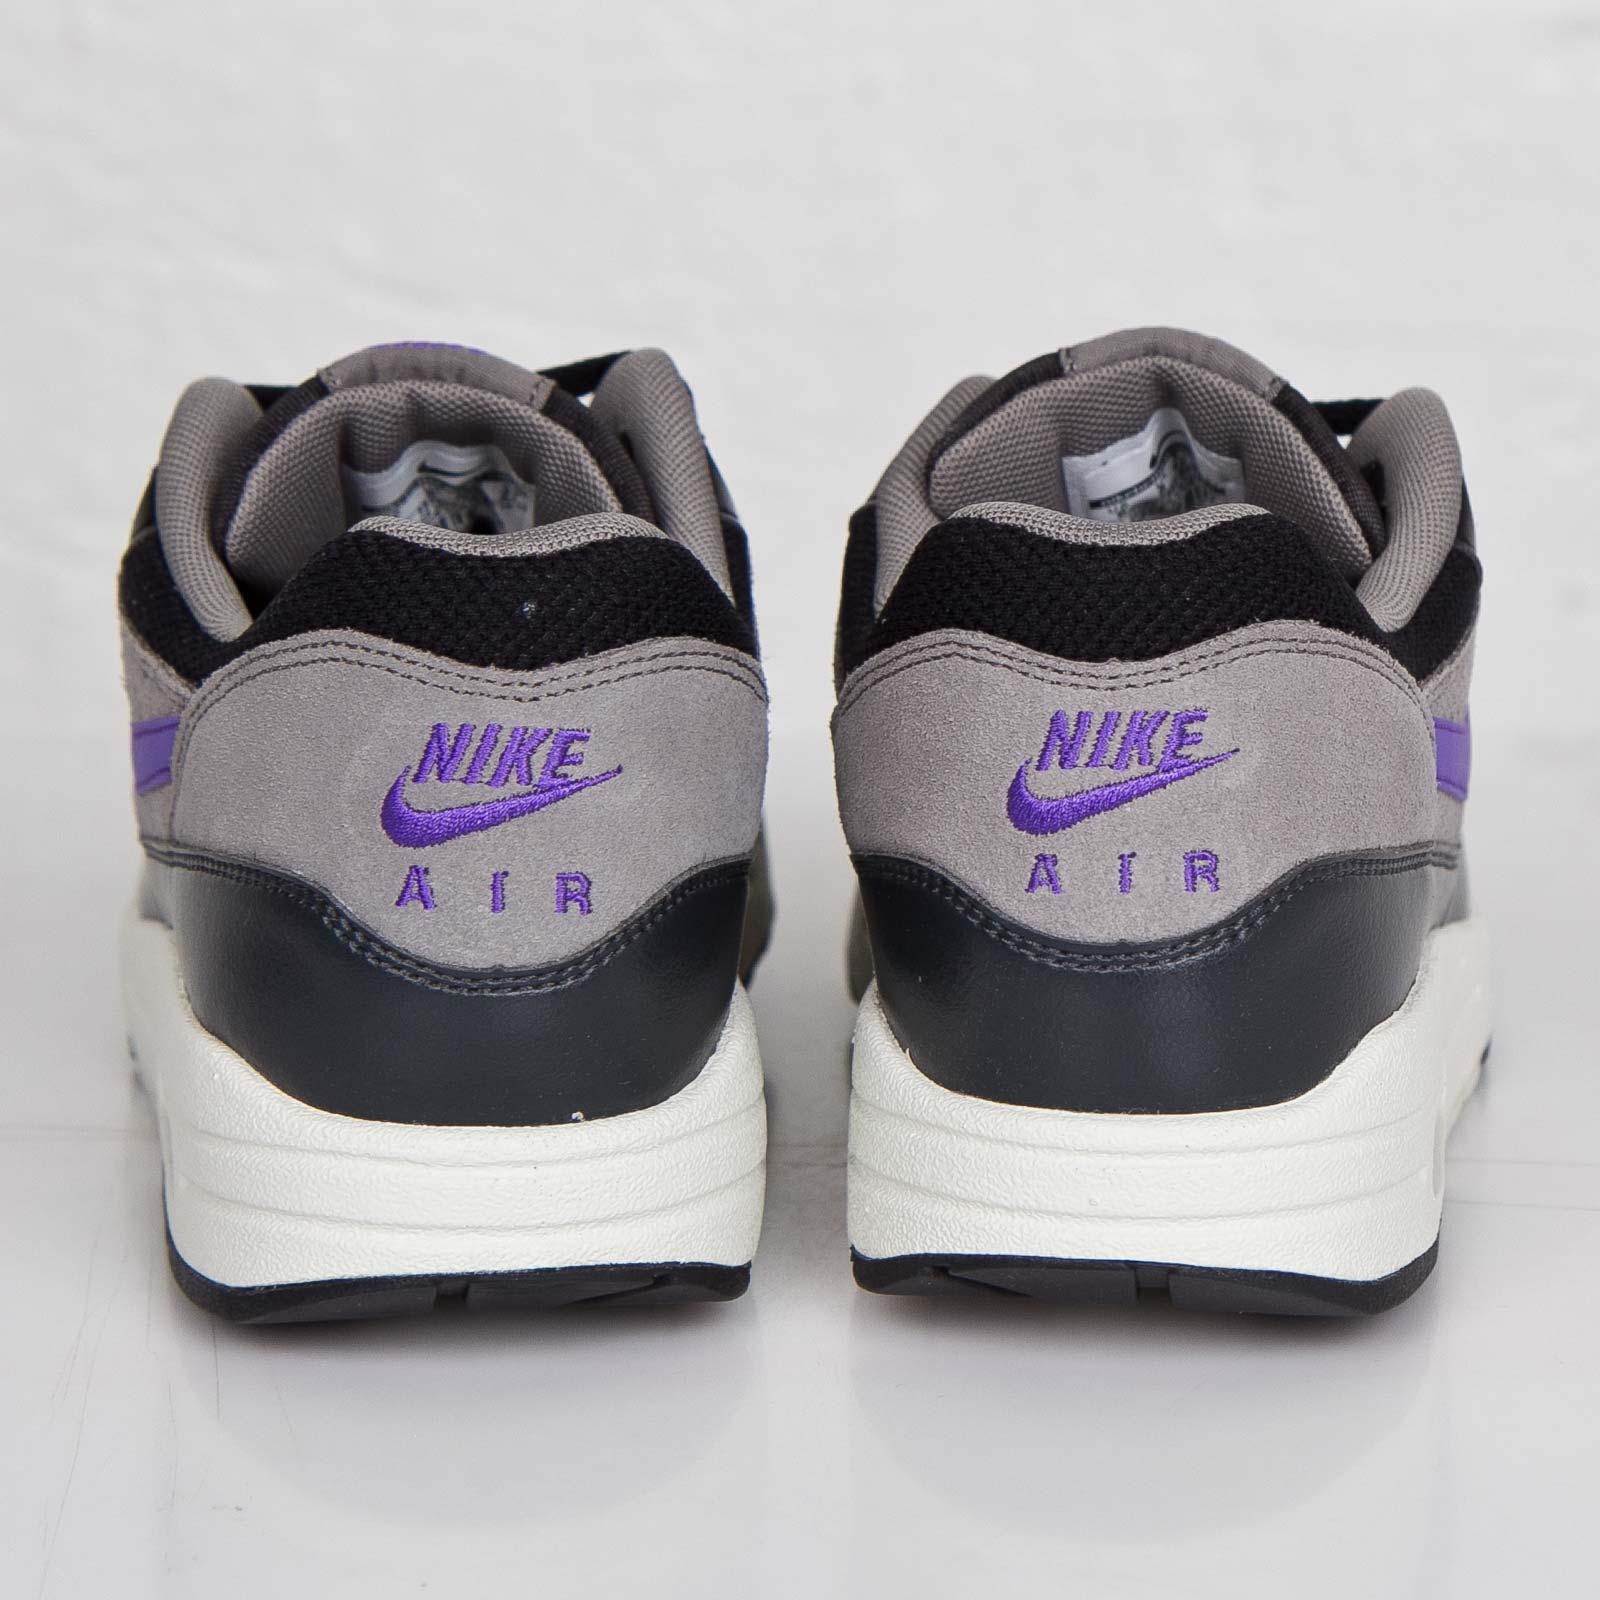 Nike Air Max 1 Black Hyper Grape Light Ash